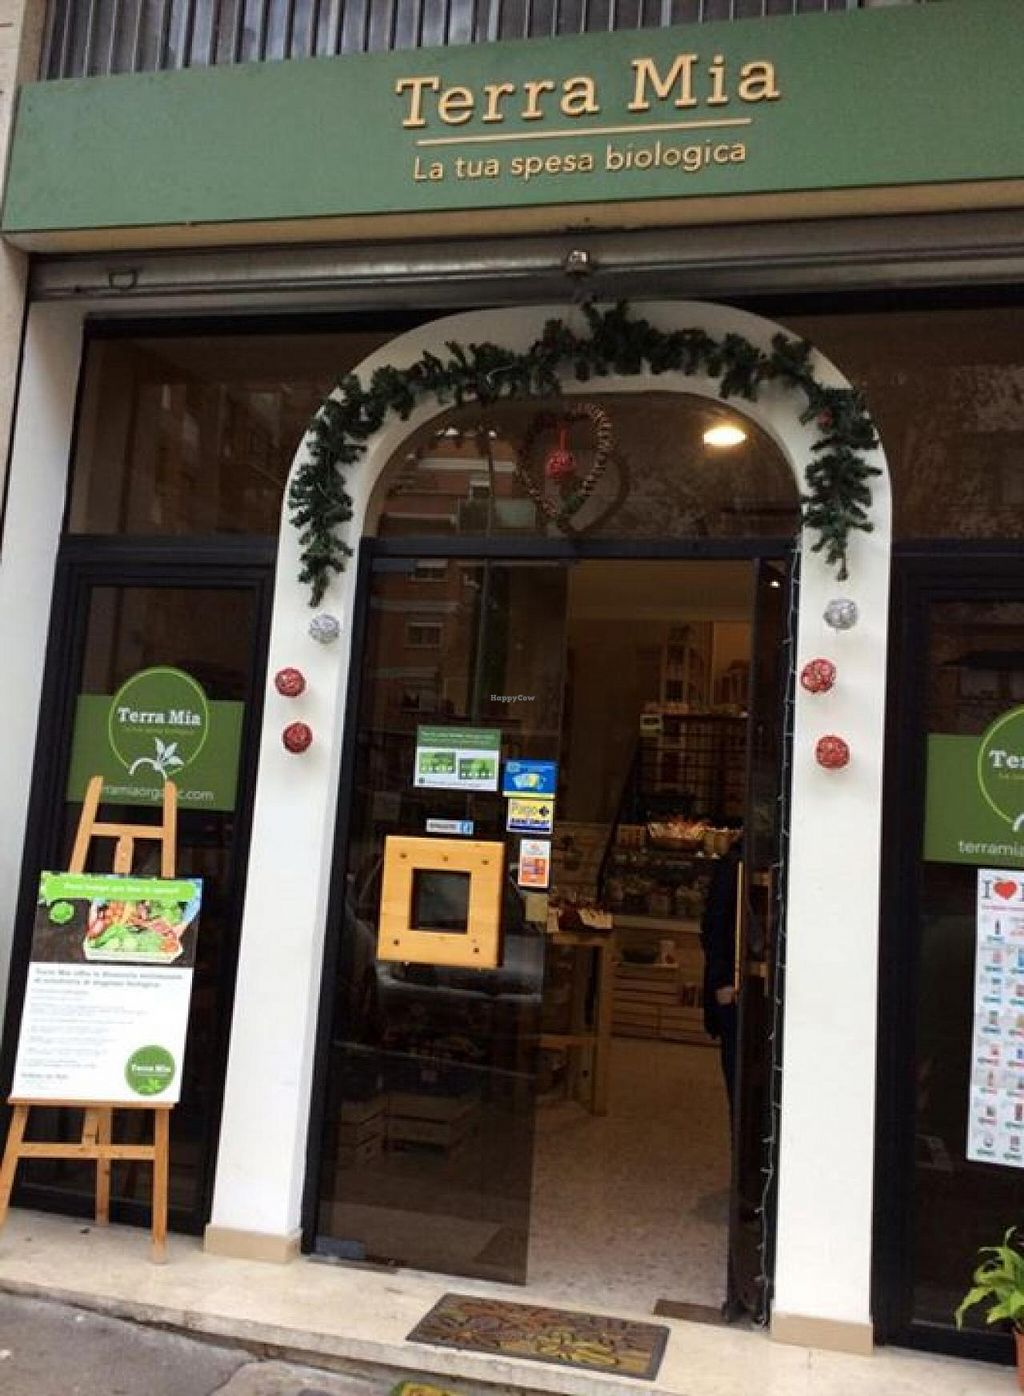 "Photo of Terra Mia Organic Store  by <a href=""/members/profile/community"">community</a> <br/> Terra Mia Organic Store <br/> March 23, 2015  - <a href='/contact/abuse/image/56246/96799'>Report</a>"